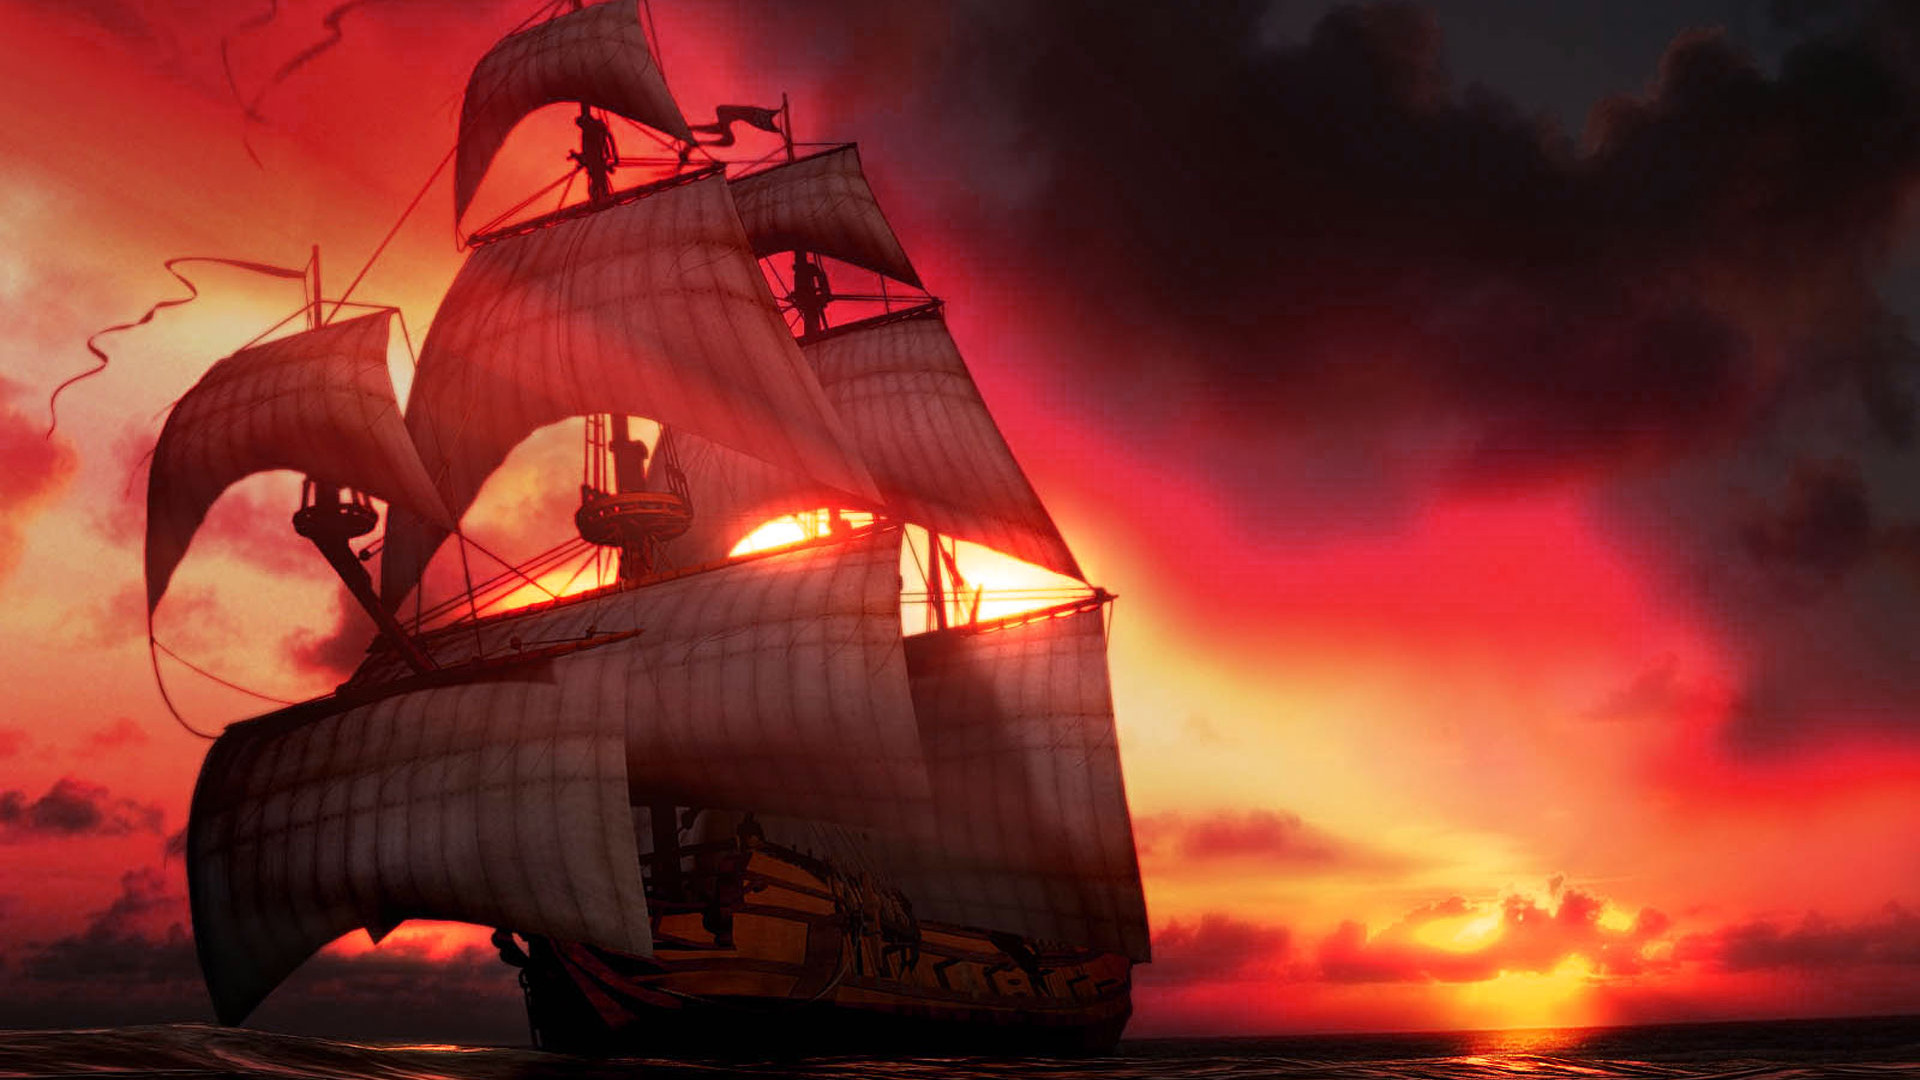 Windows Anime Wallpaper Barcos Piratas Wallpapers Barcos Piratas Reales Fondos Hd